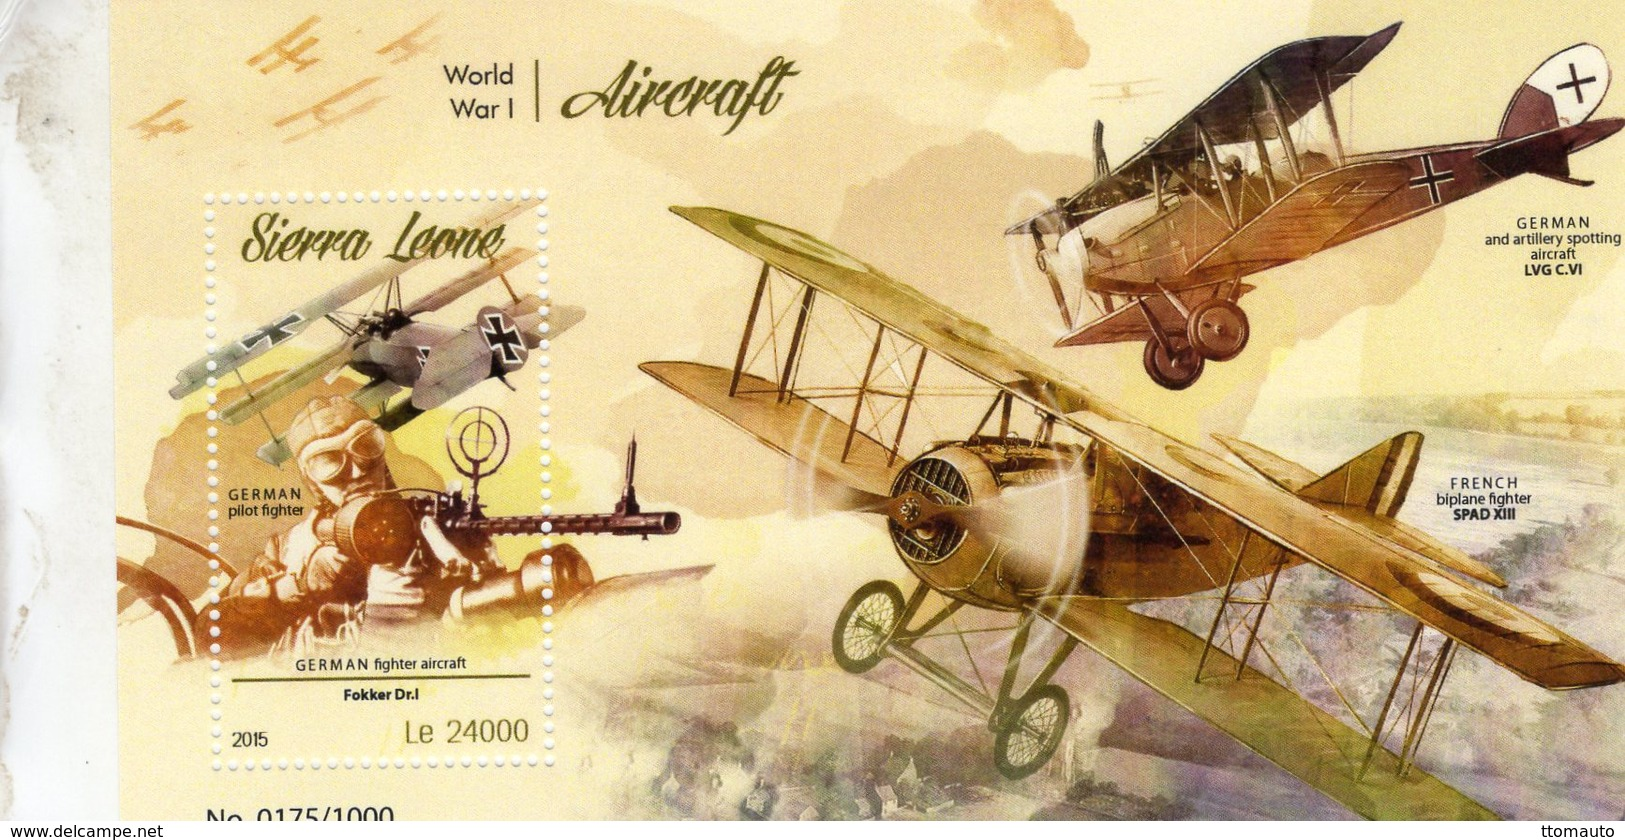 Sierra Leone 2015  -  Aicraft Of World War I  -  Spad - LVG - Fokker  -  1v MS Neuf/Mint/MNH - Aerei